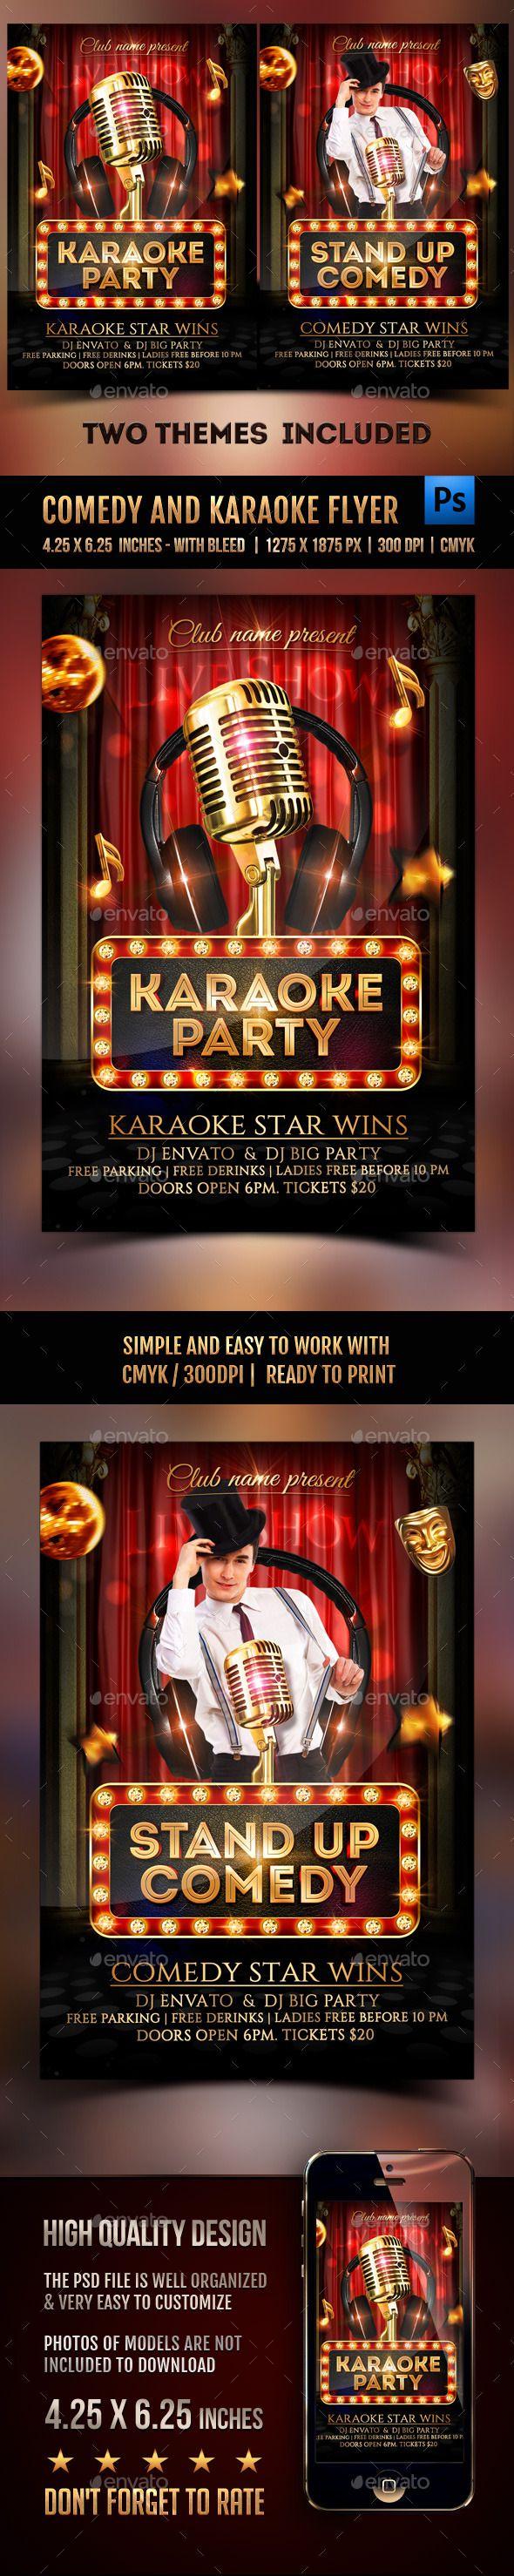 Pin By Best Graphic Design On Flyer Templates Pinterest Karaoke